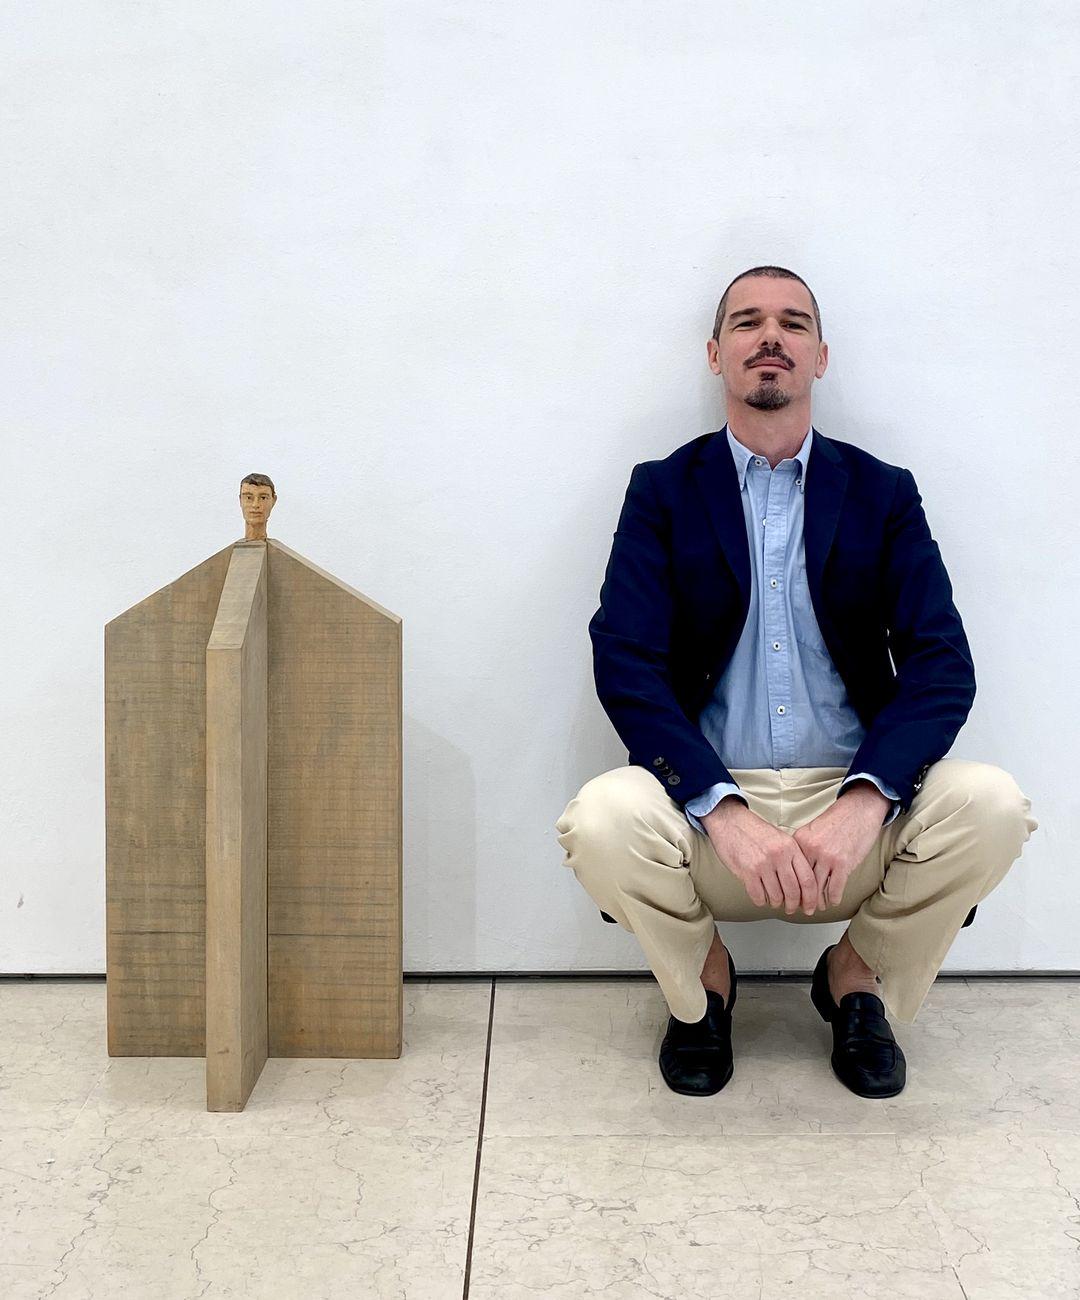 Memmo Grilli con Turm (2007, pioppo e vernice, cm 79x40x40) di Stephan Balkenhol